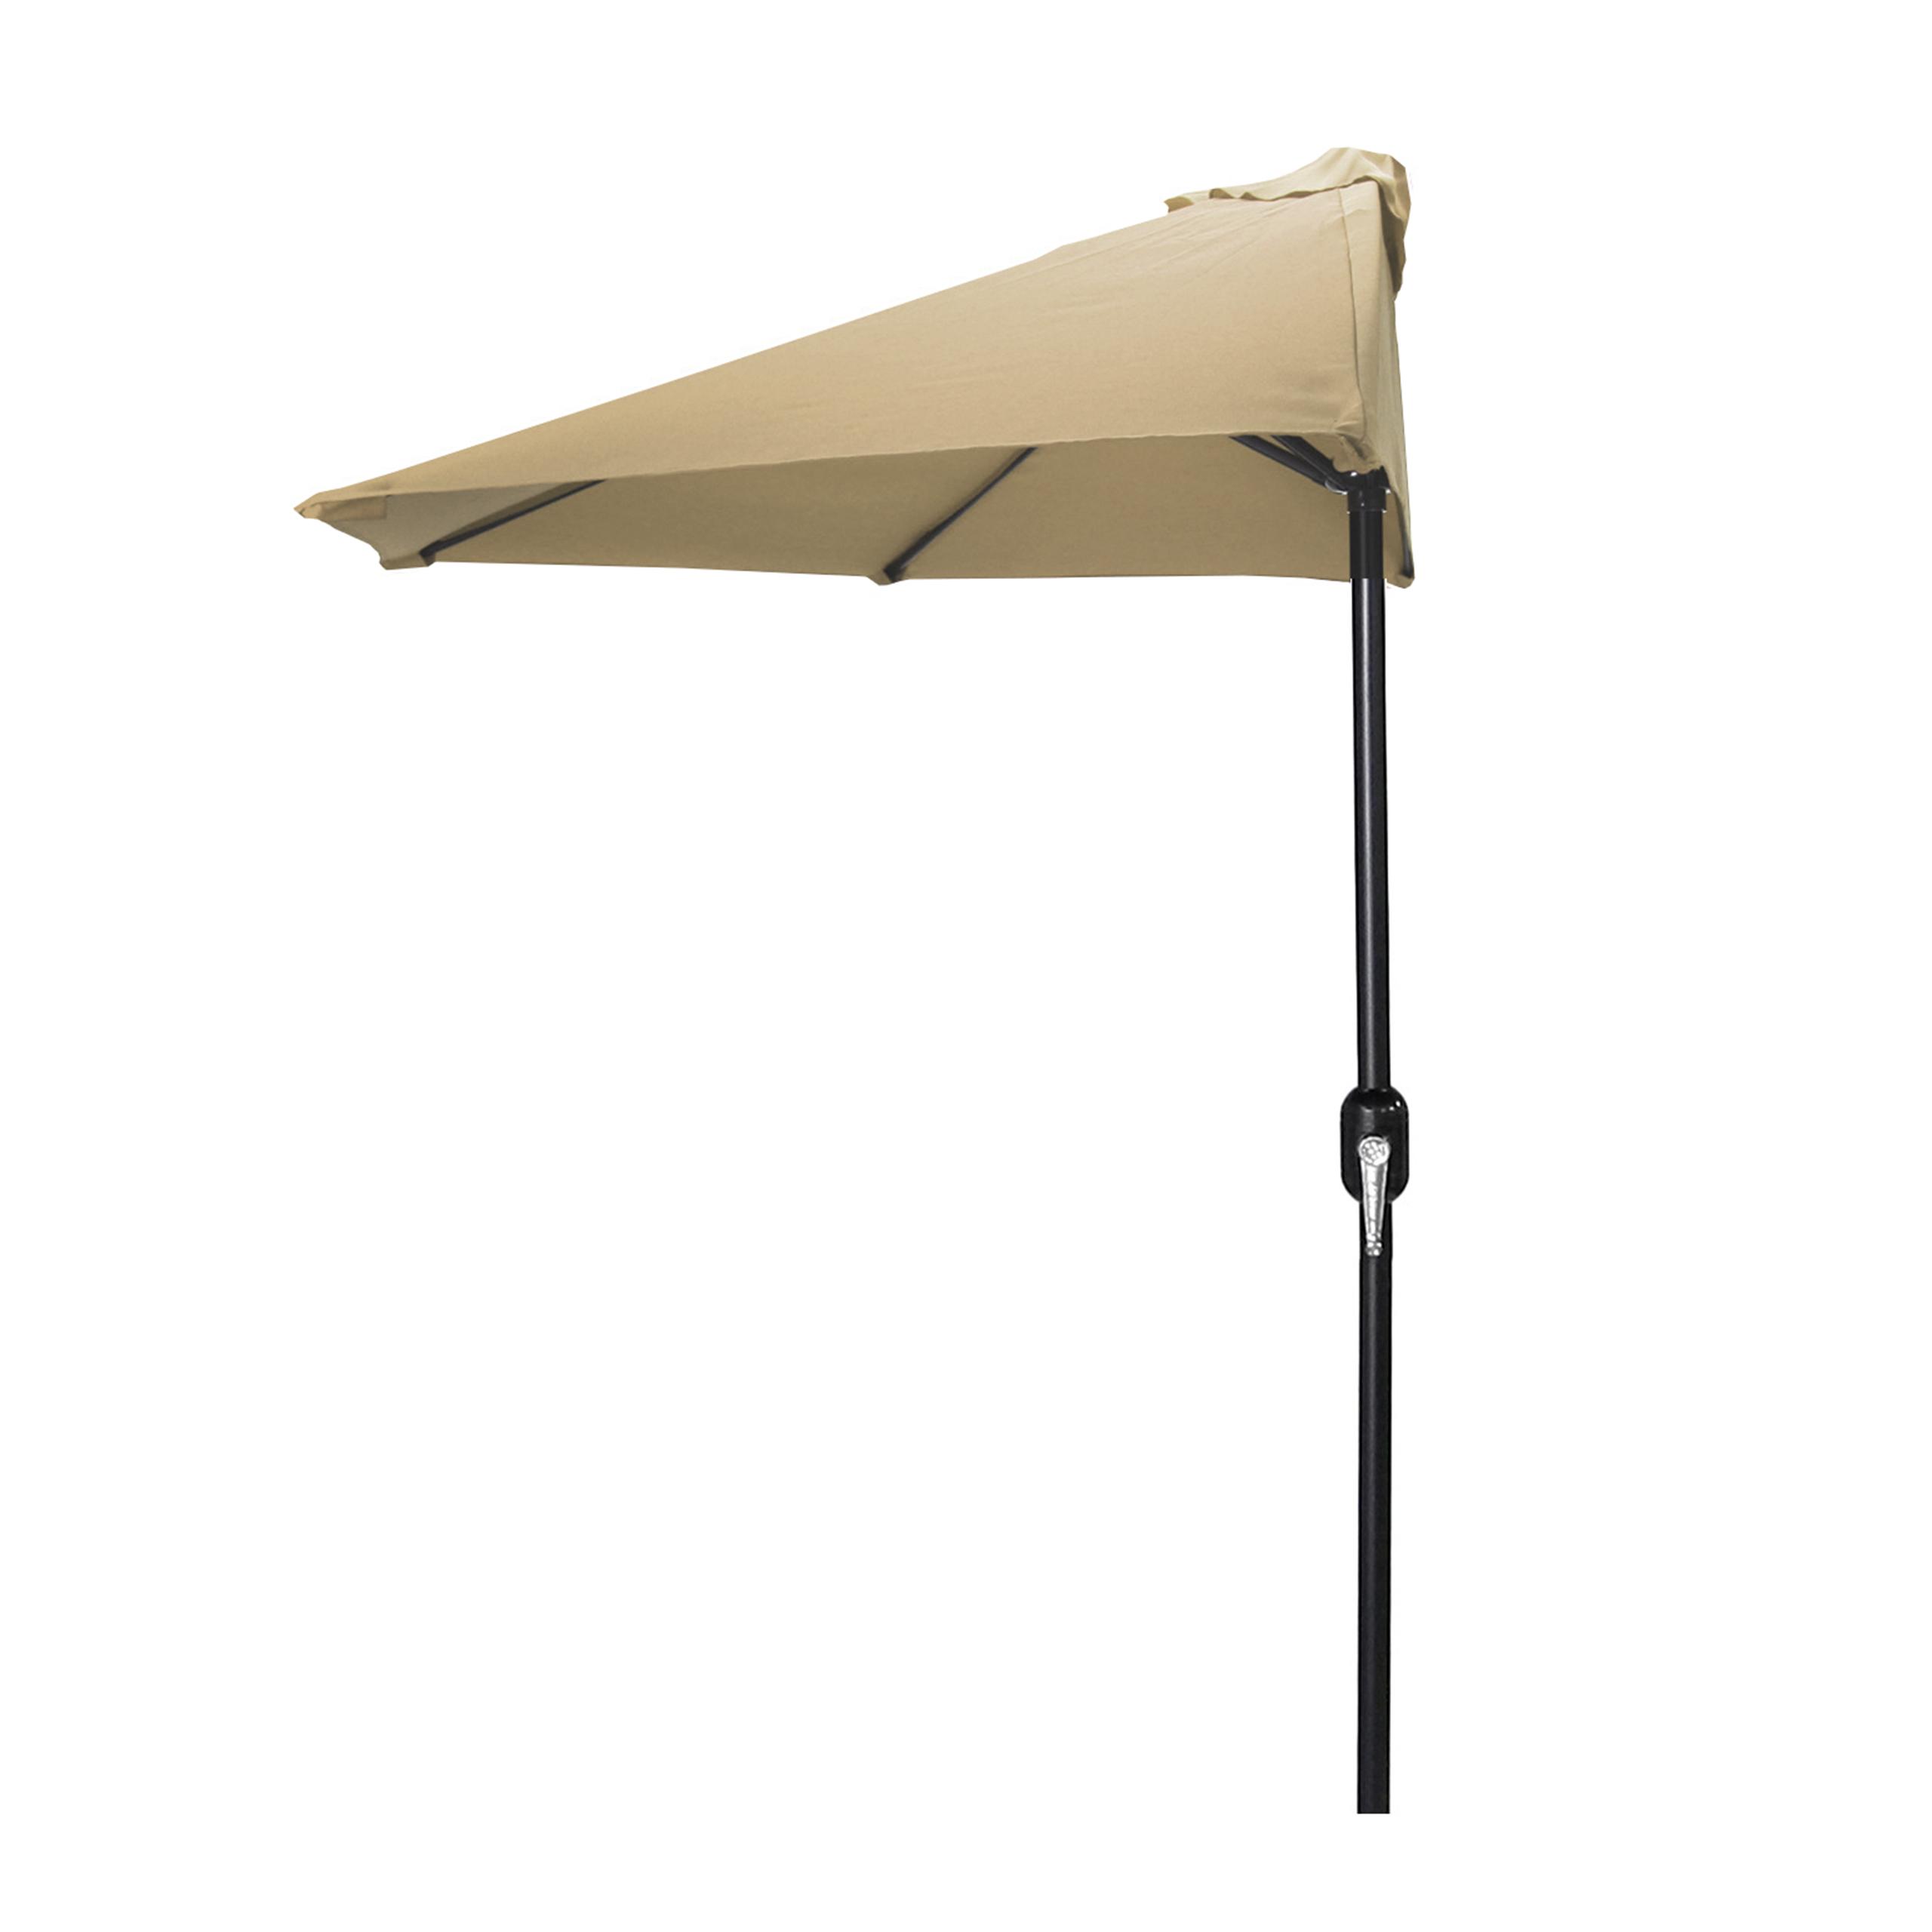 Parasol Voor Balkon.Balkonklem Voor Parasol Parasol Zonnescherm O 258 Cm Beige Calabria